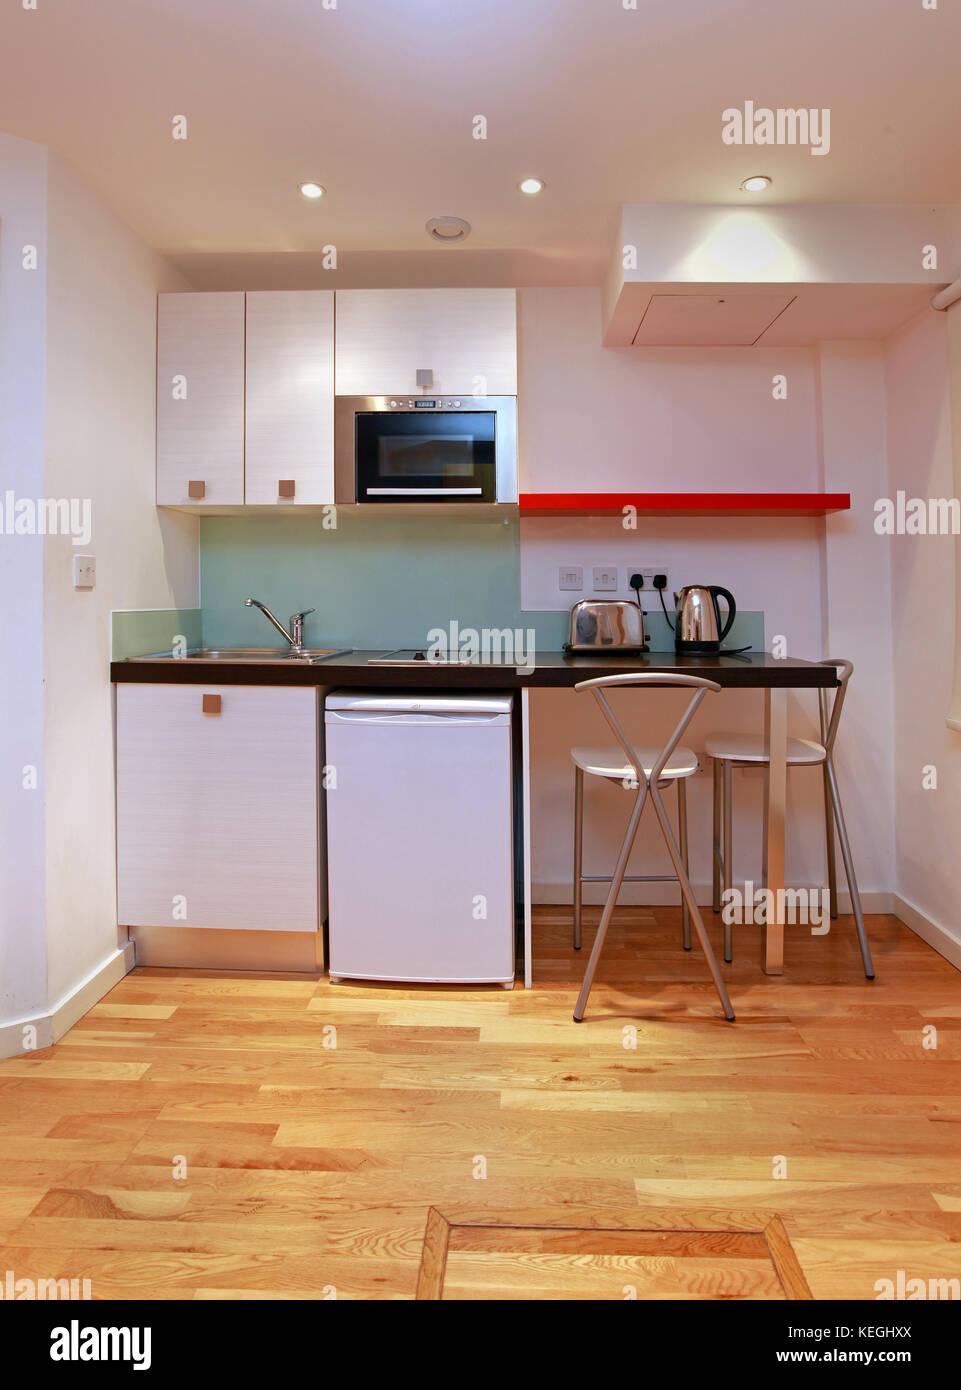 Small studio apartment interior stock photos small for Modern studio kitchen